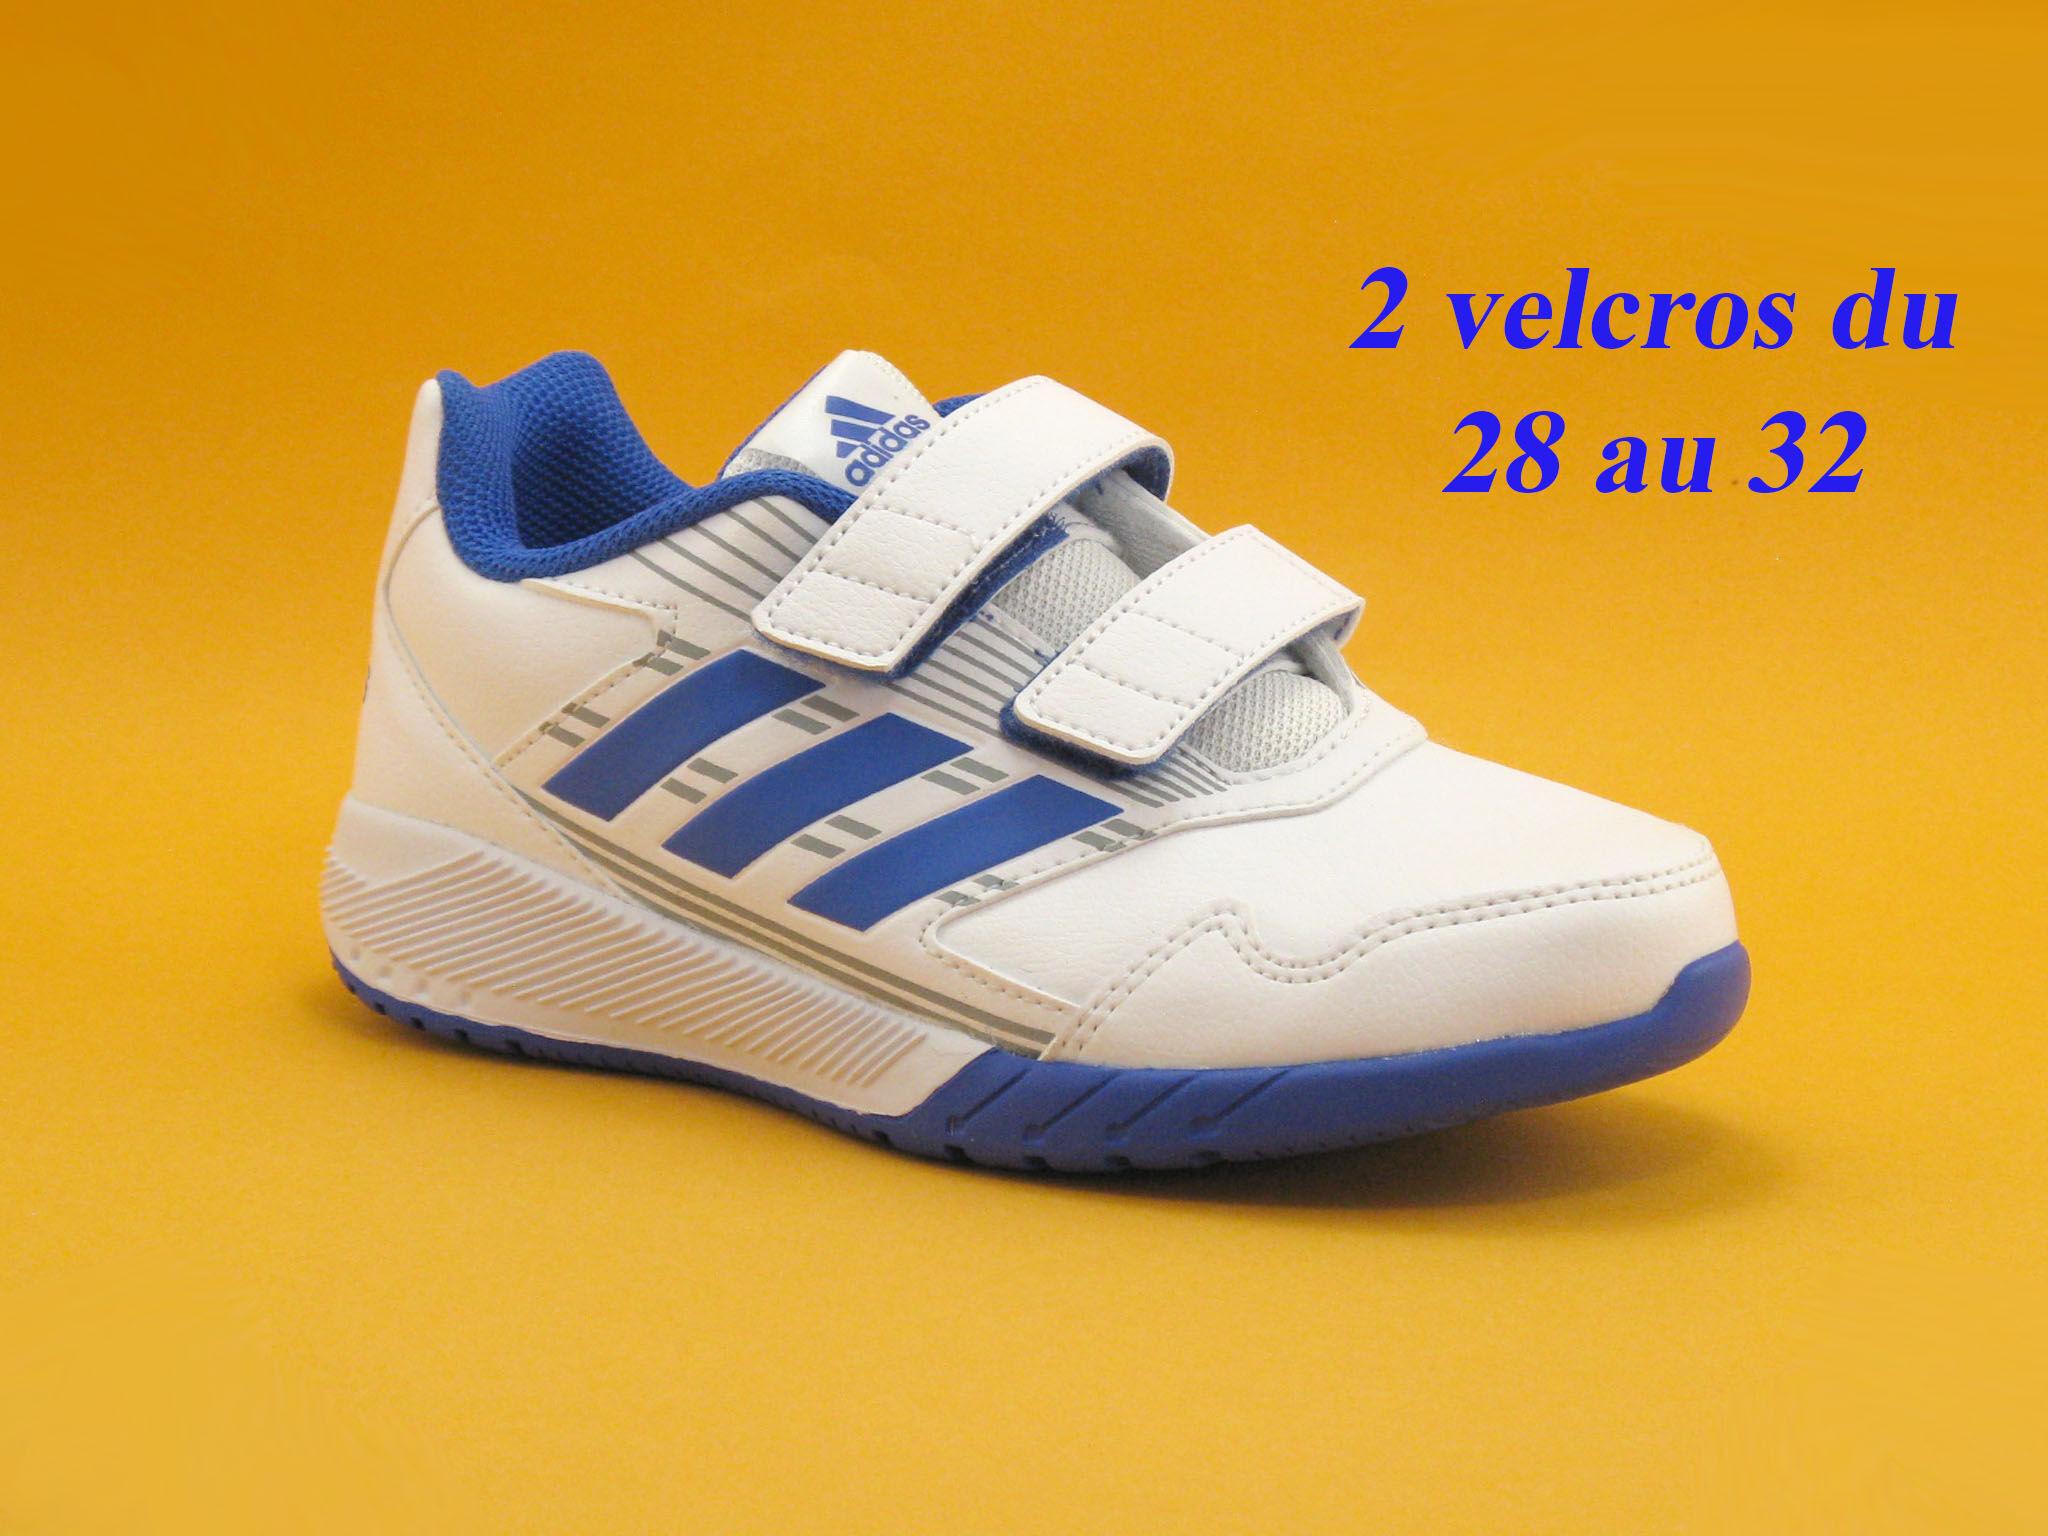 Adidas Basket Enfant Adidas - Blanc,Bleu - Point. 28,29,30,31,32,33,34,35,36